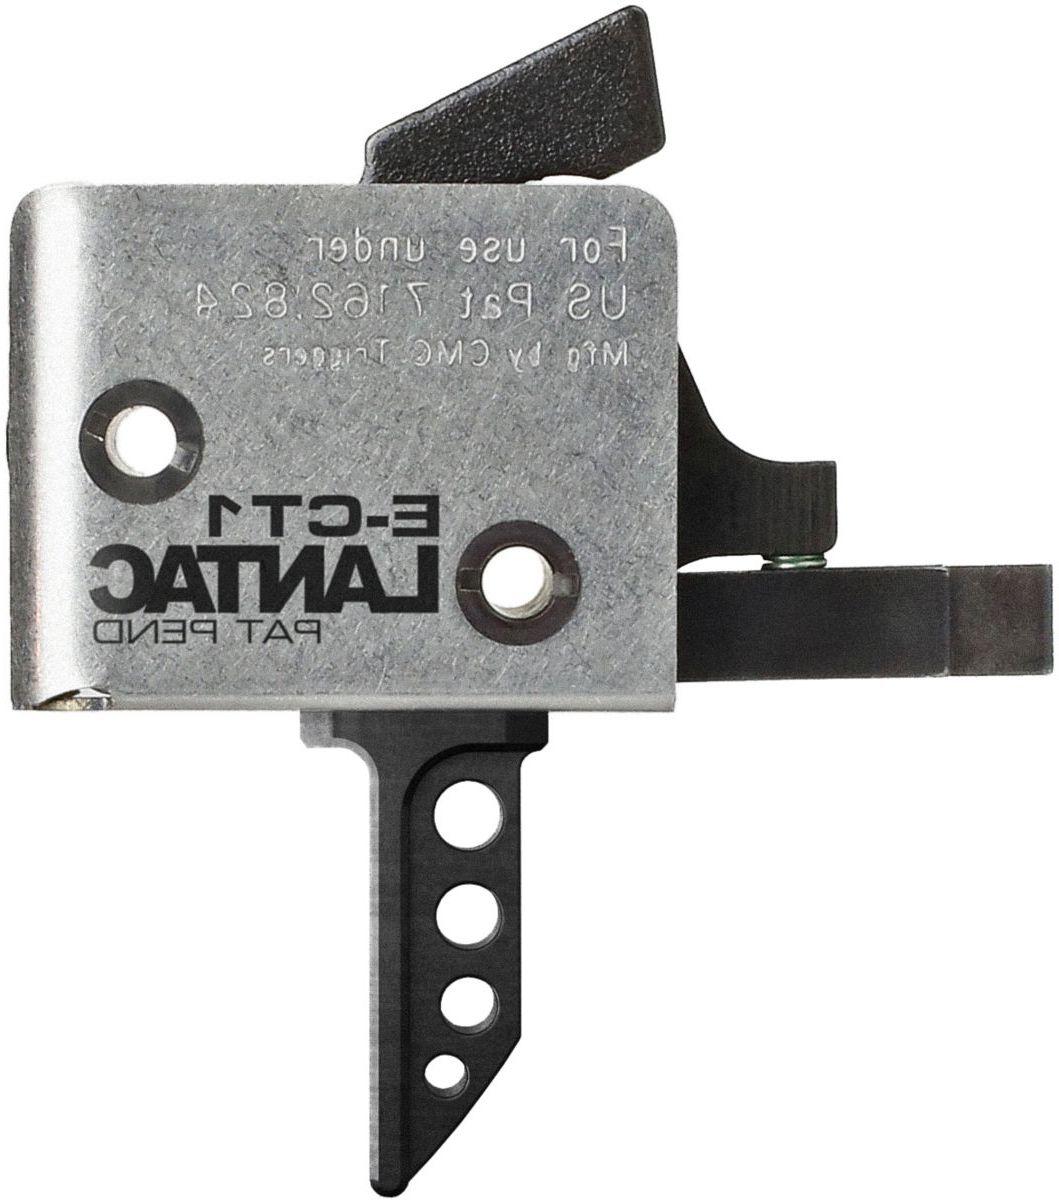 LANTAC™ CMC E-CT1 Triggers